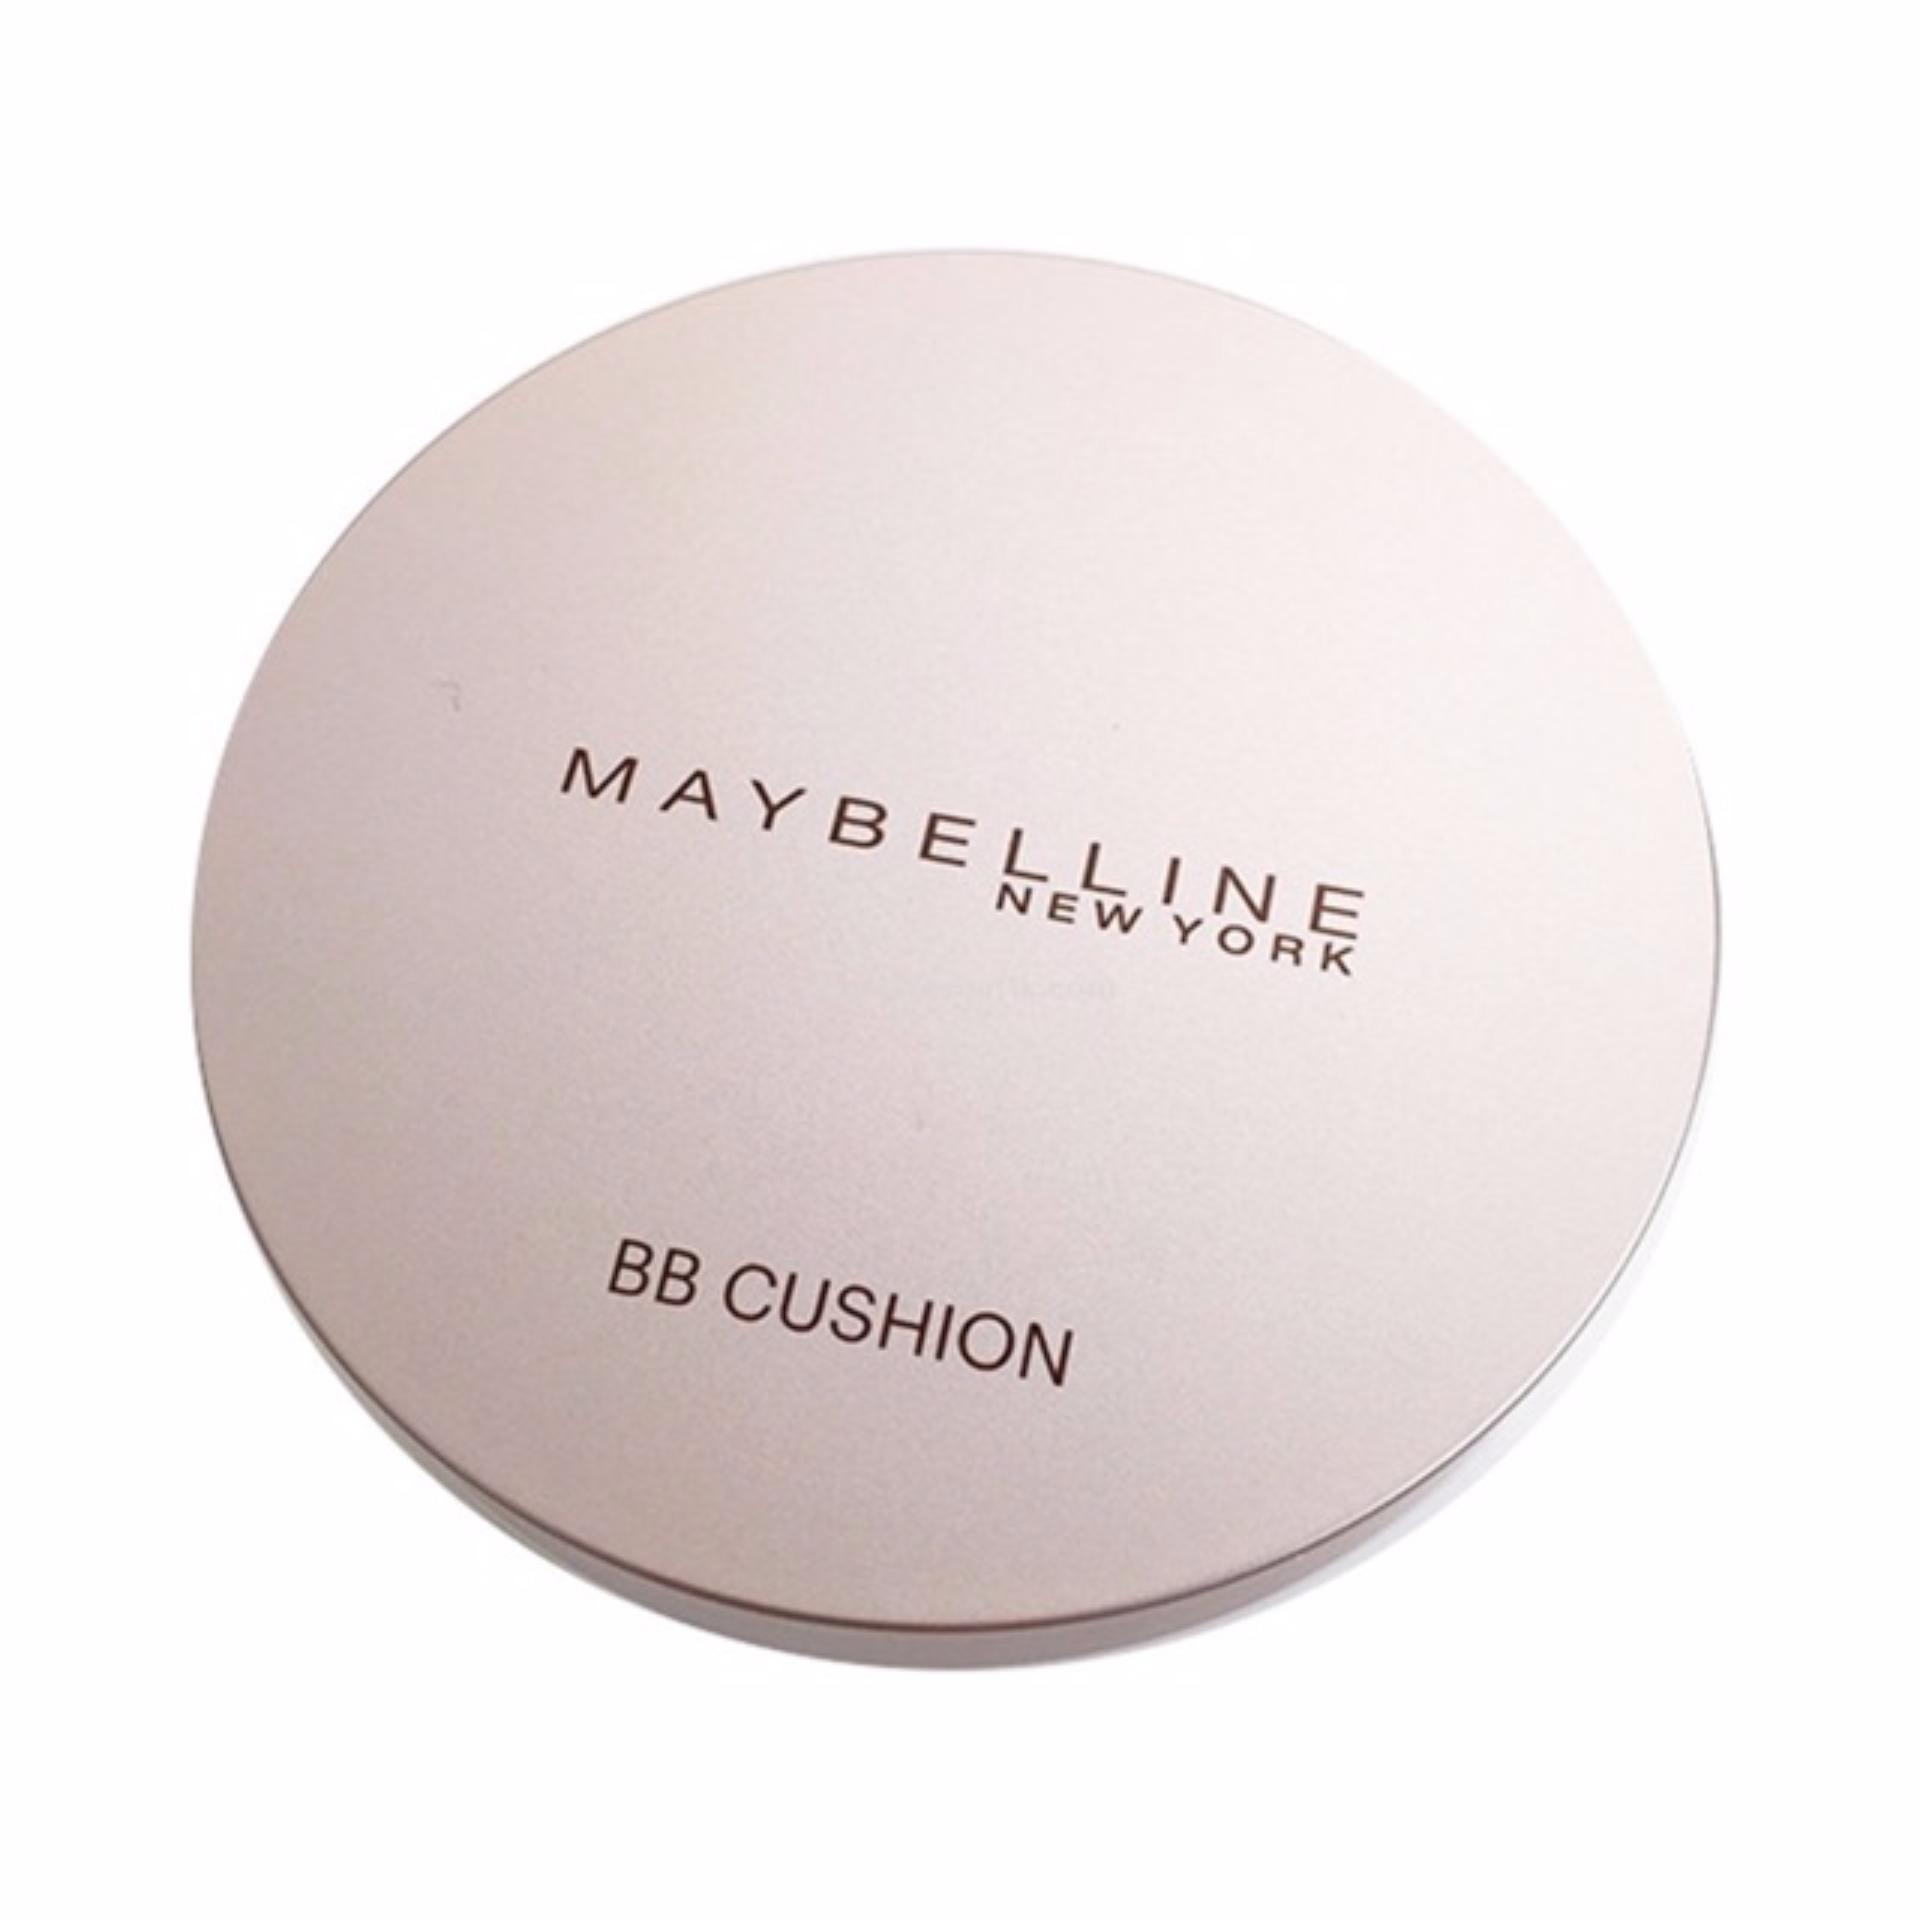 ... Maybelline Super BB Cushion 03 Natural | Cocok Untuk Kulit Kering Normal ...